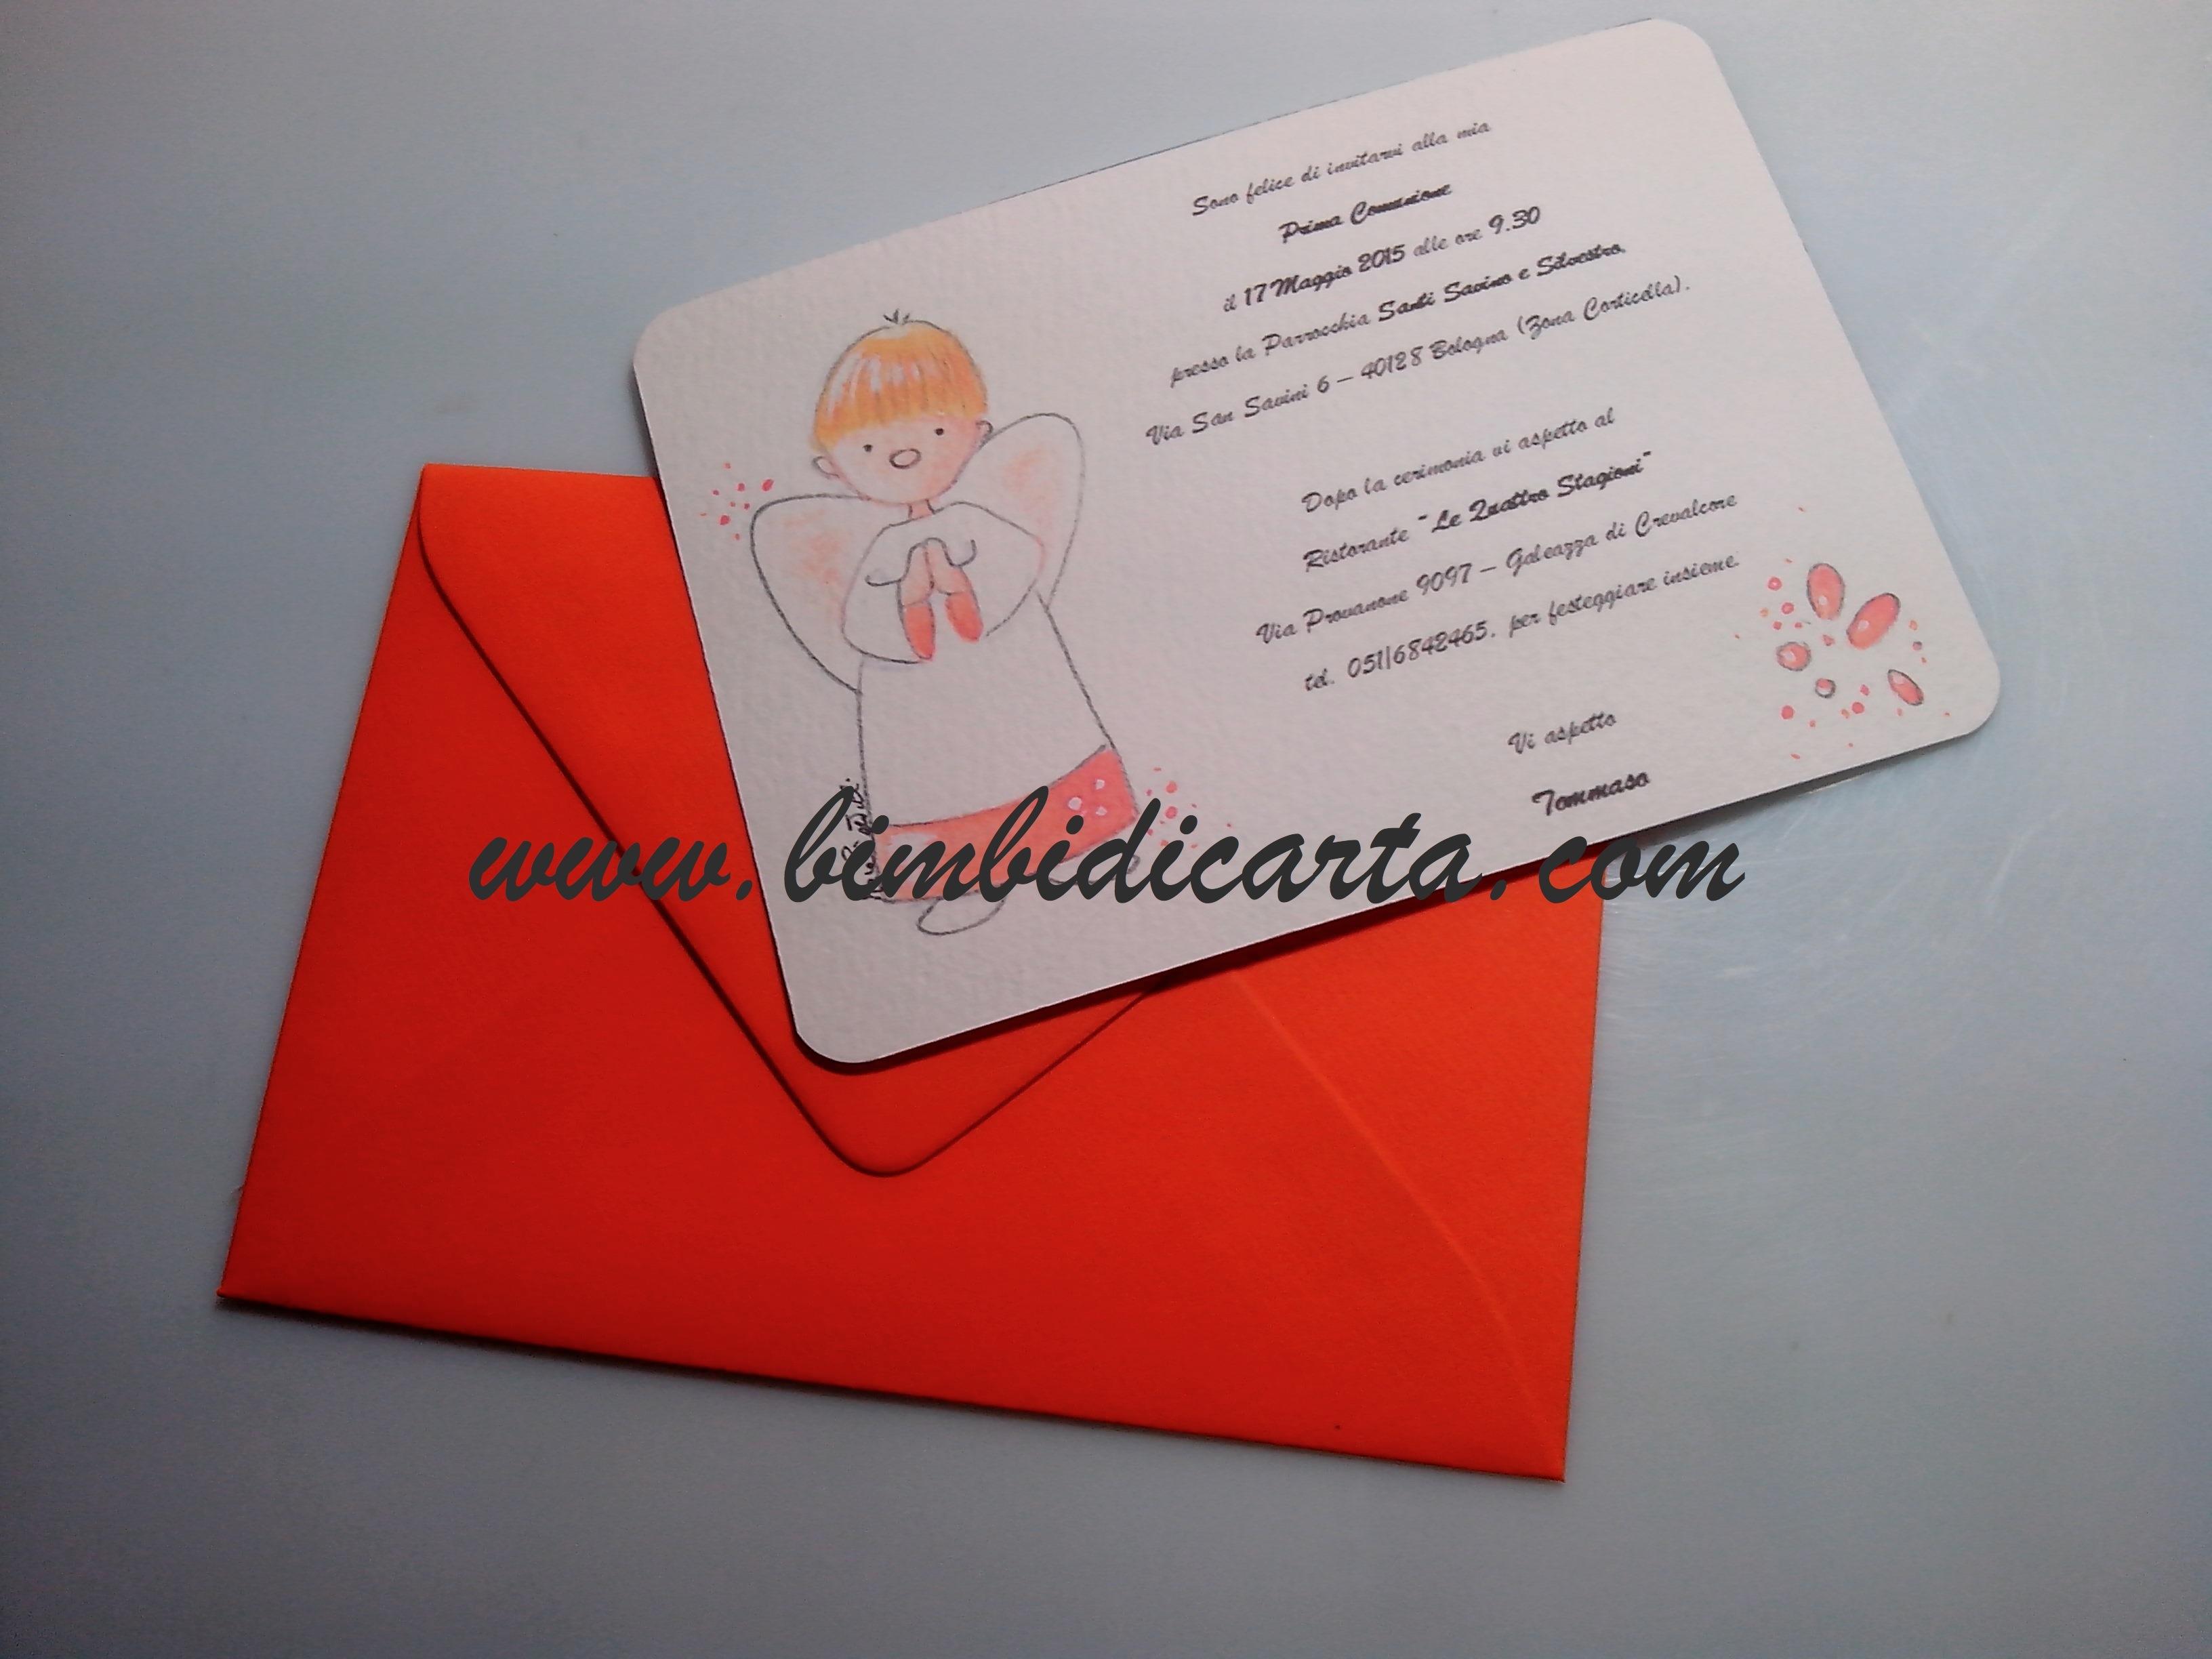 Popolare Biglietti Archivi - Pagina 3 di 10 - Bimbi di Carta NK99